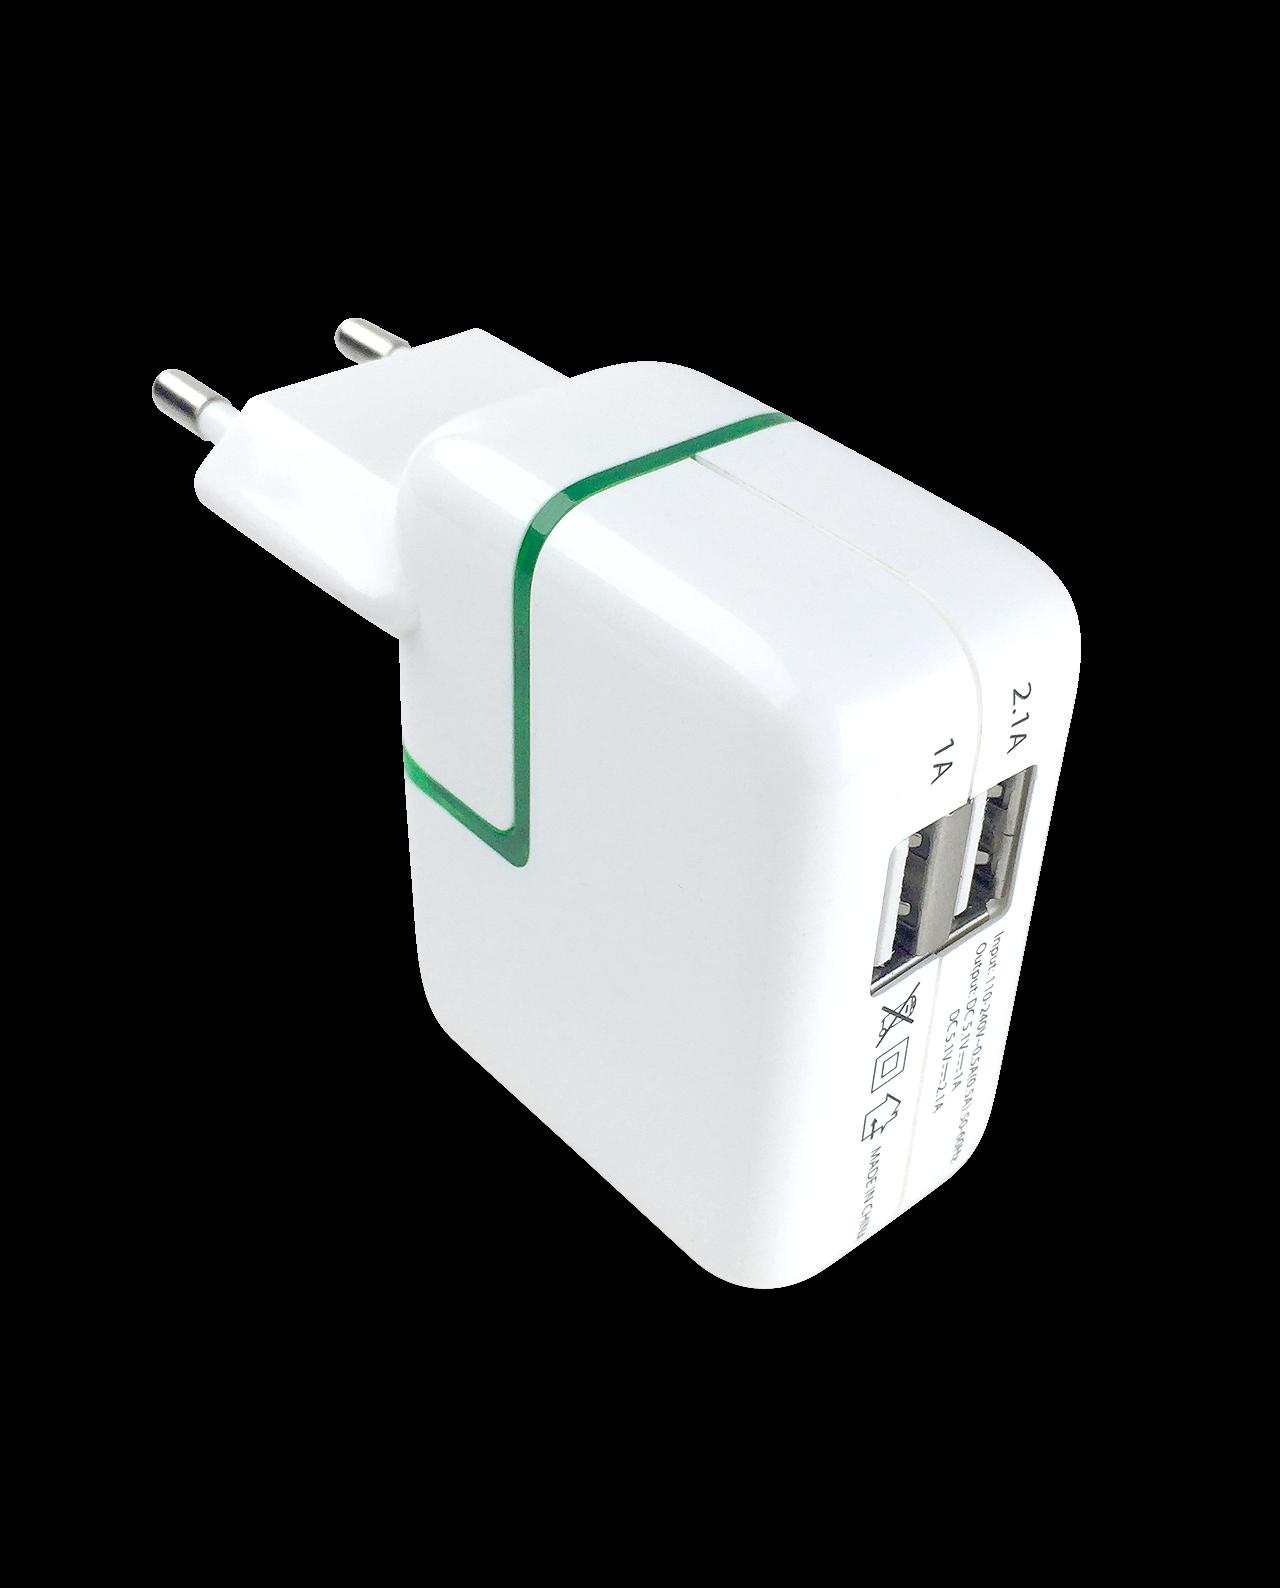 12w Usb Power Adapter Istore